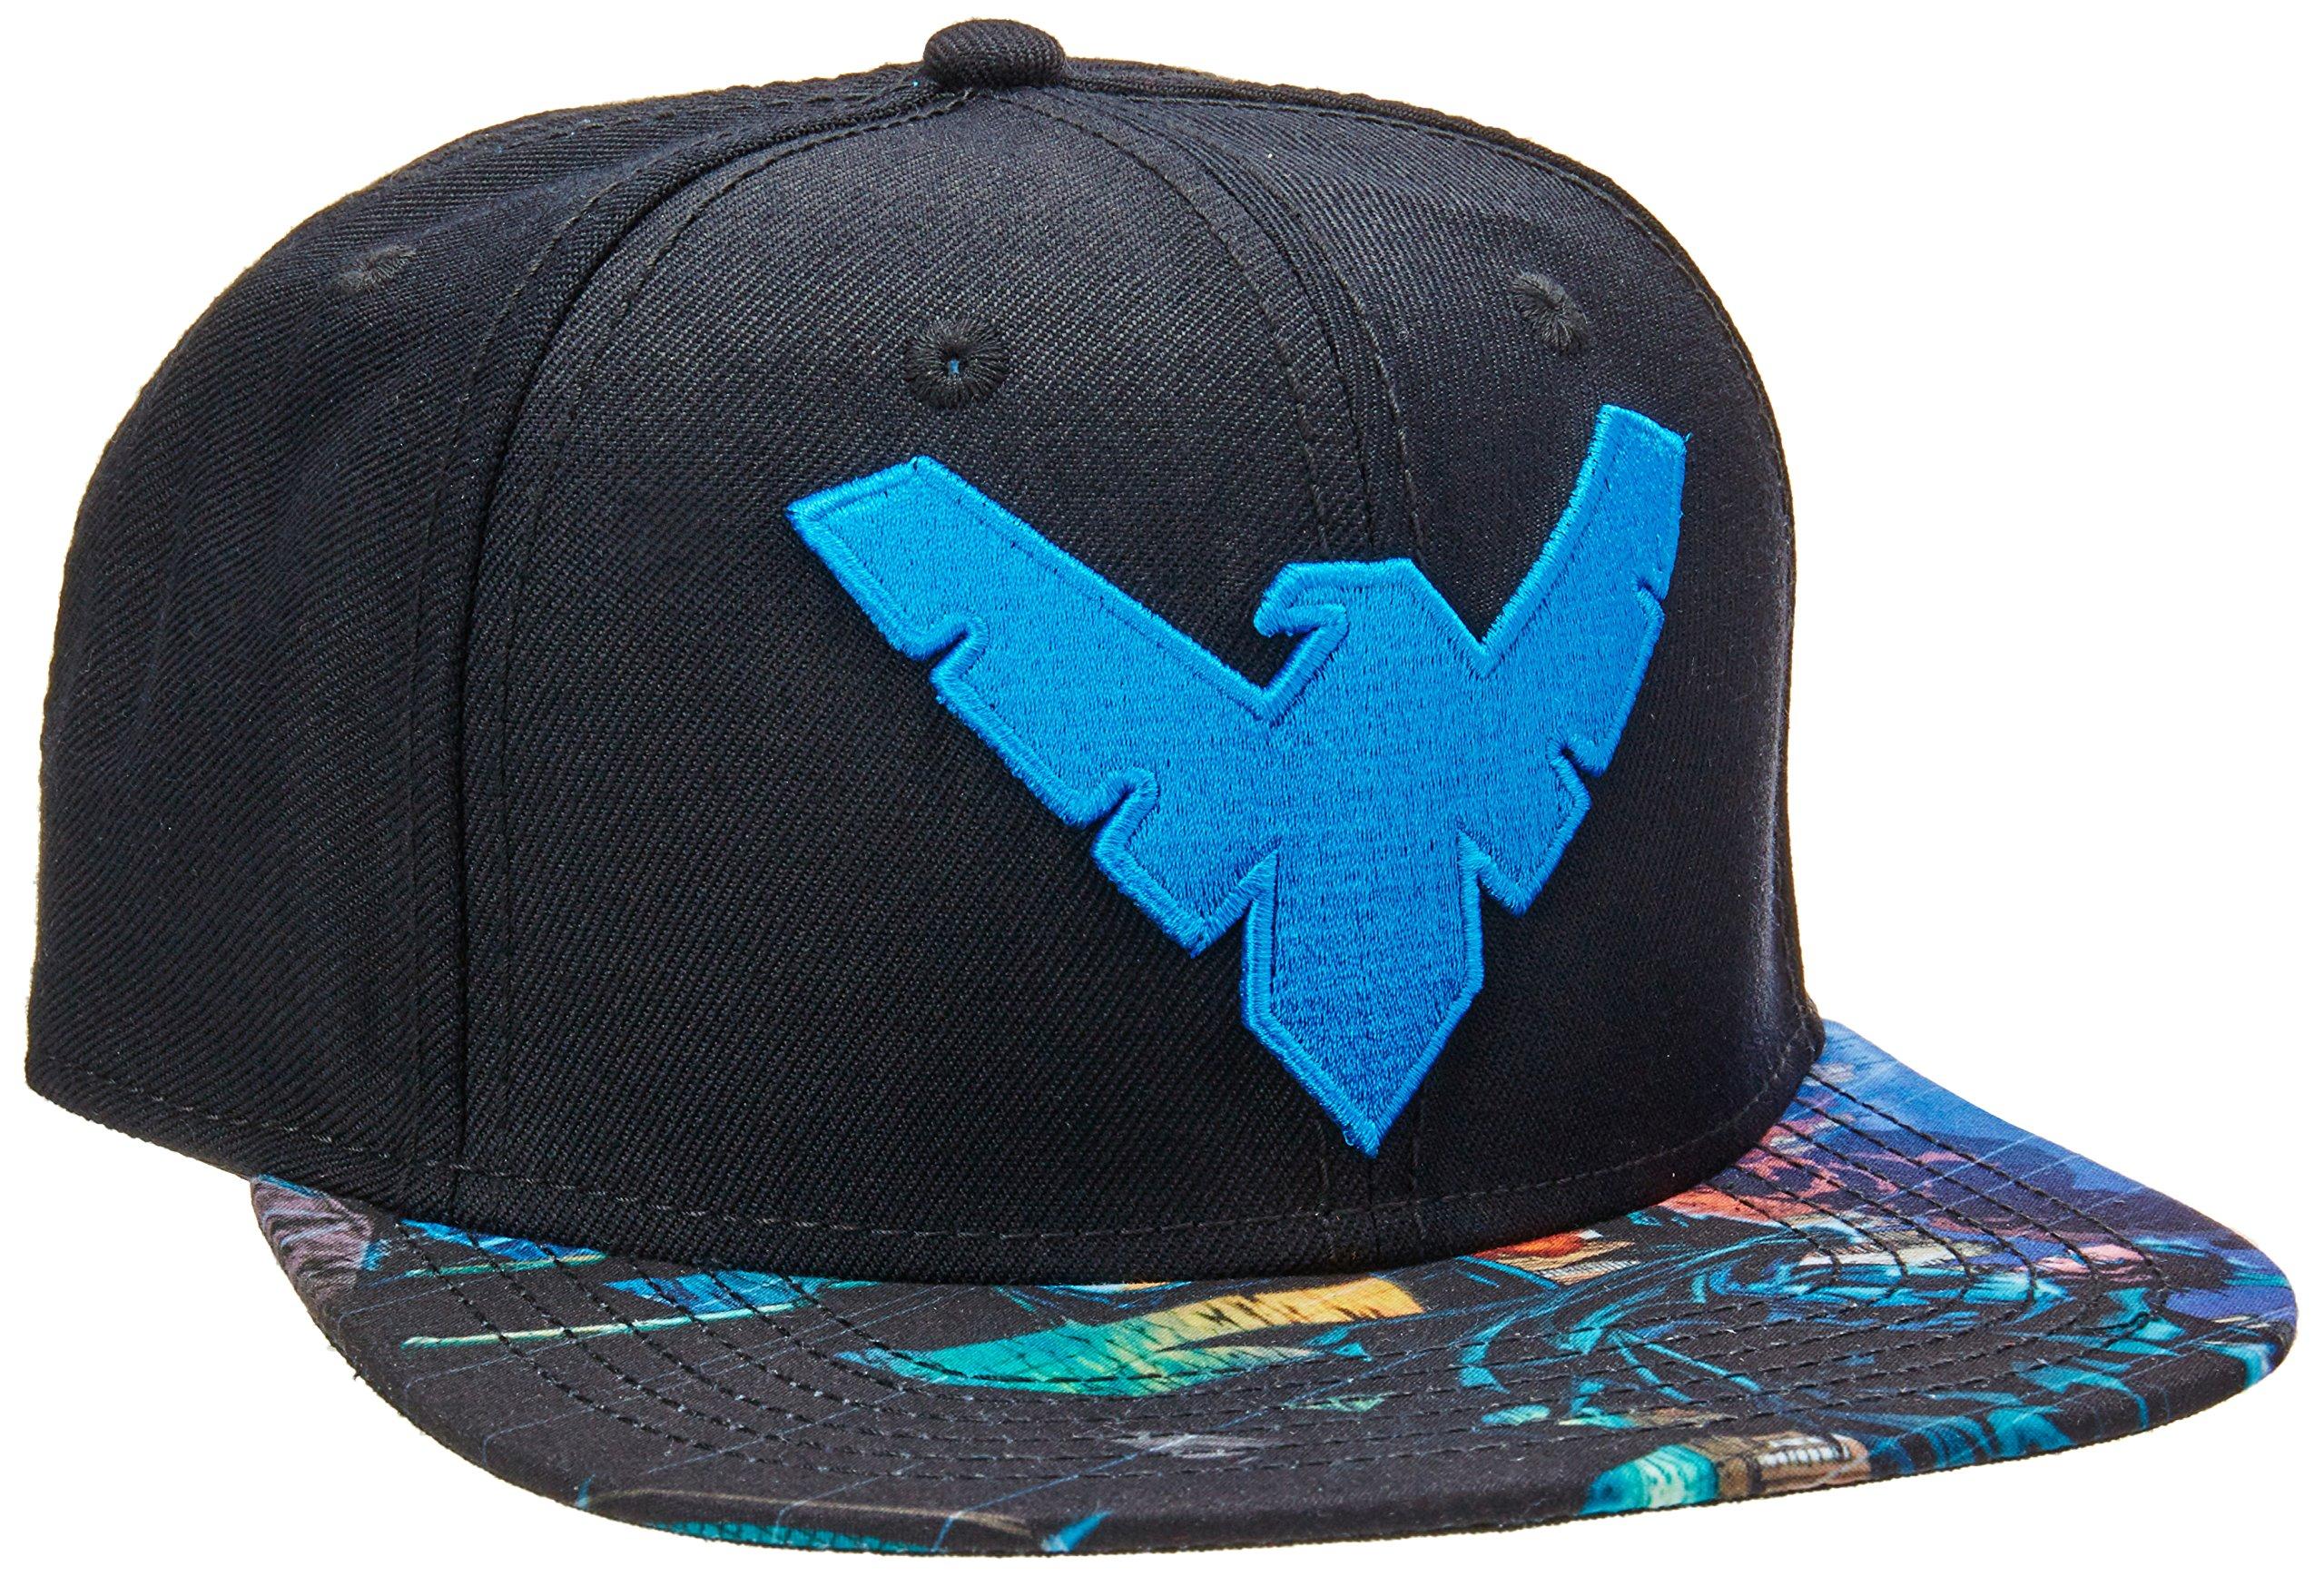 BIOWORLD DC Comics Batman Nightwing Logo Sublimated Bill Snapback Cap 0429155e9b80